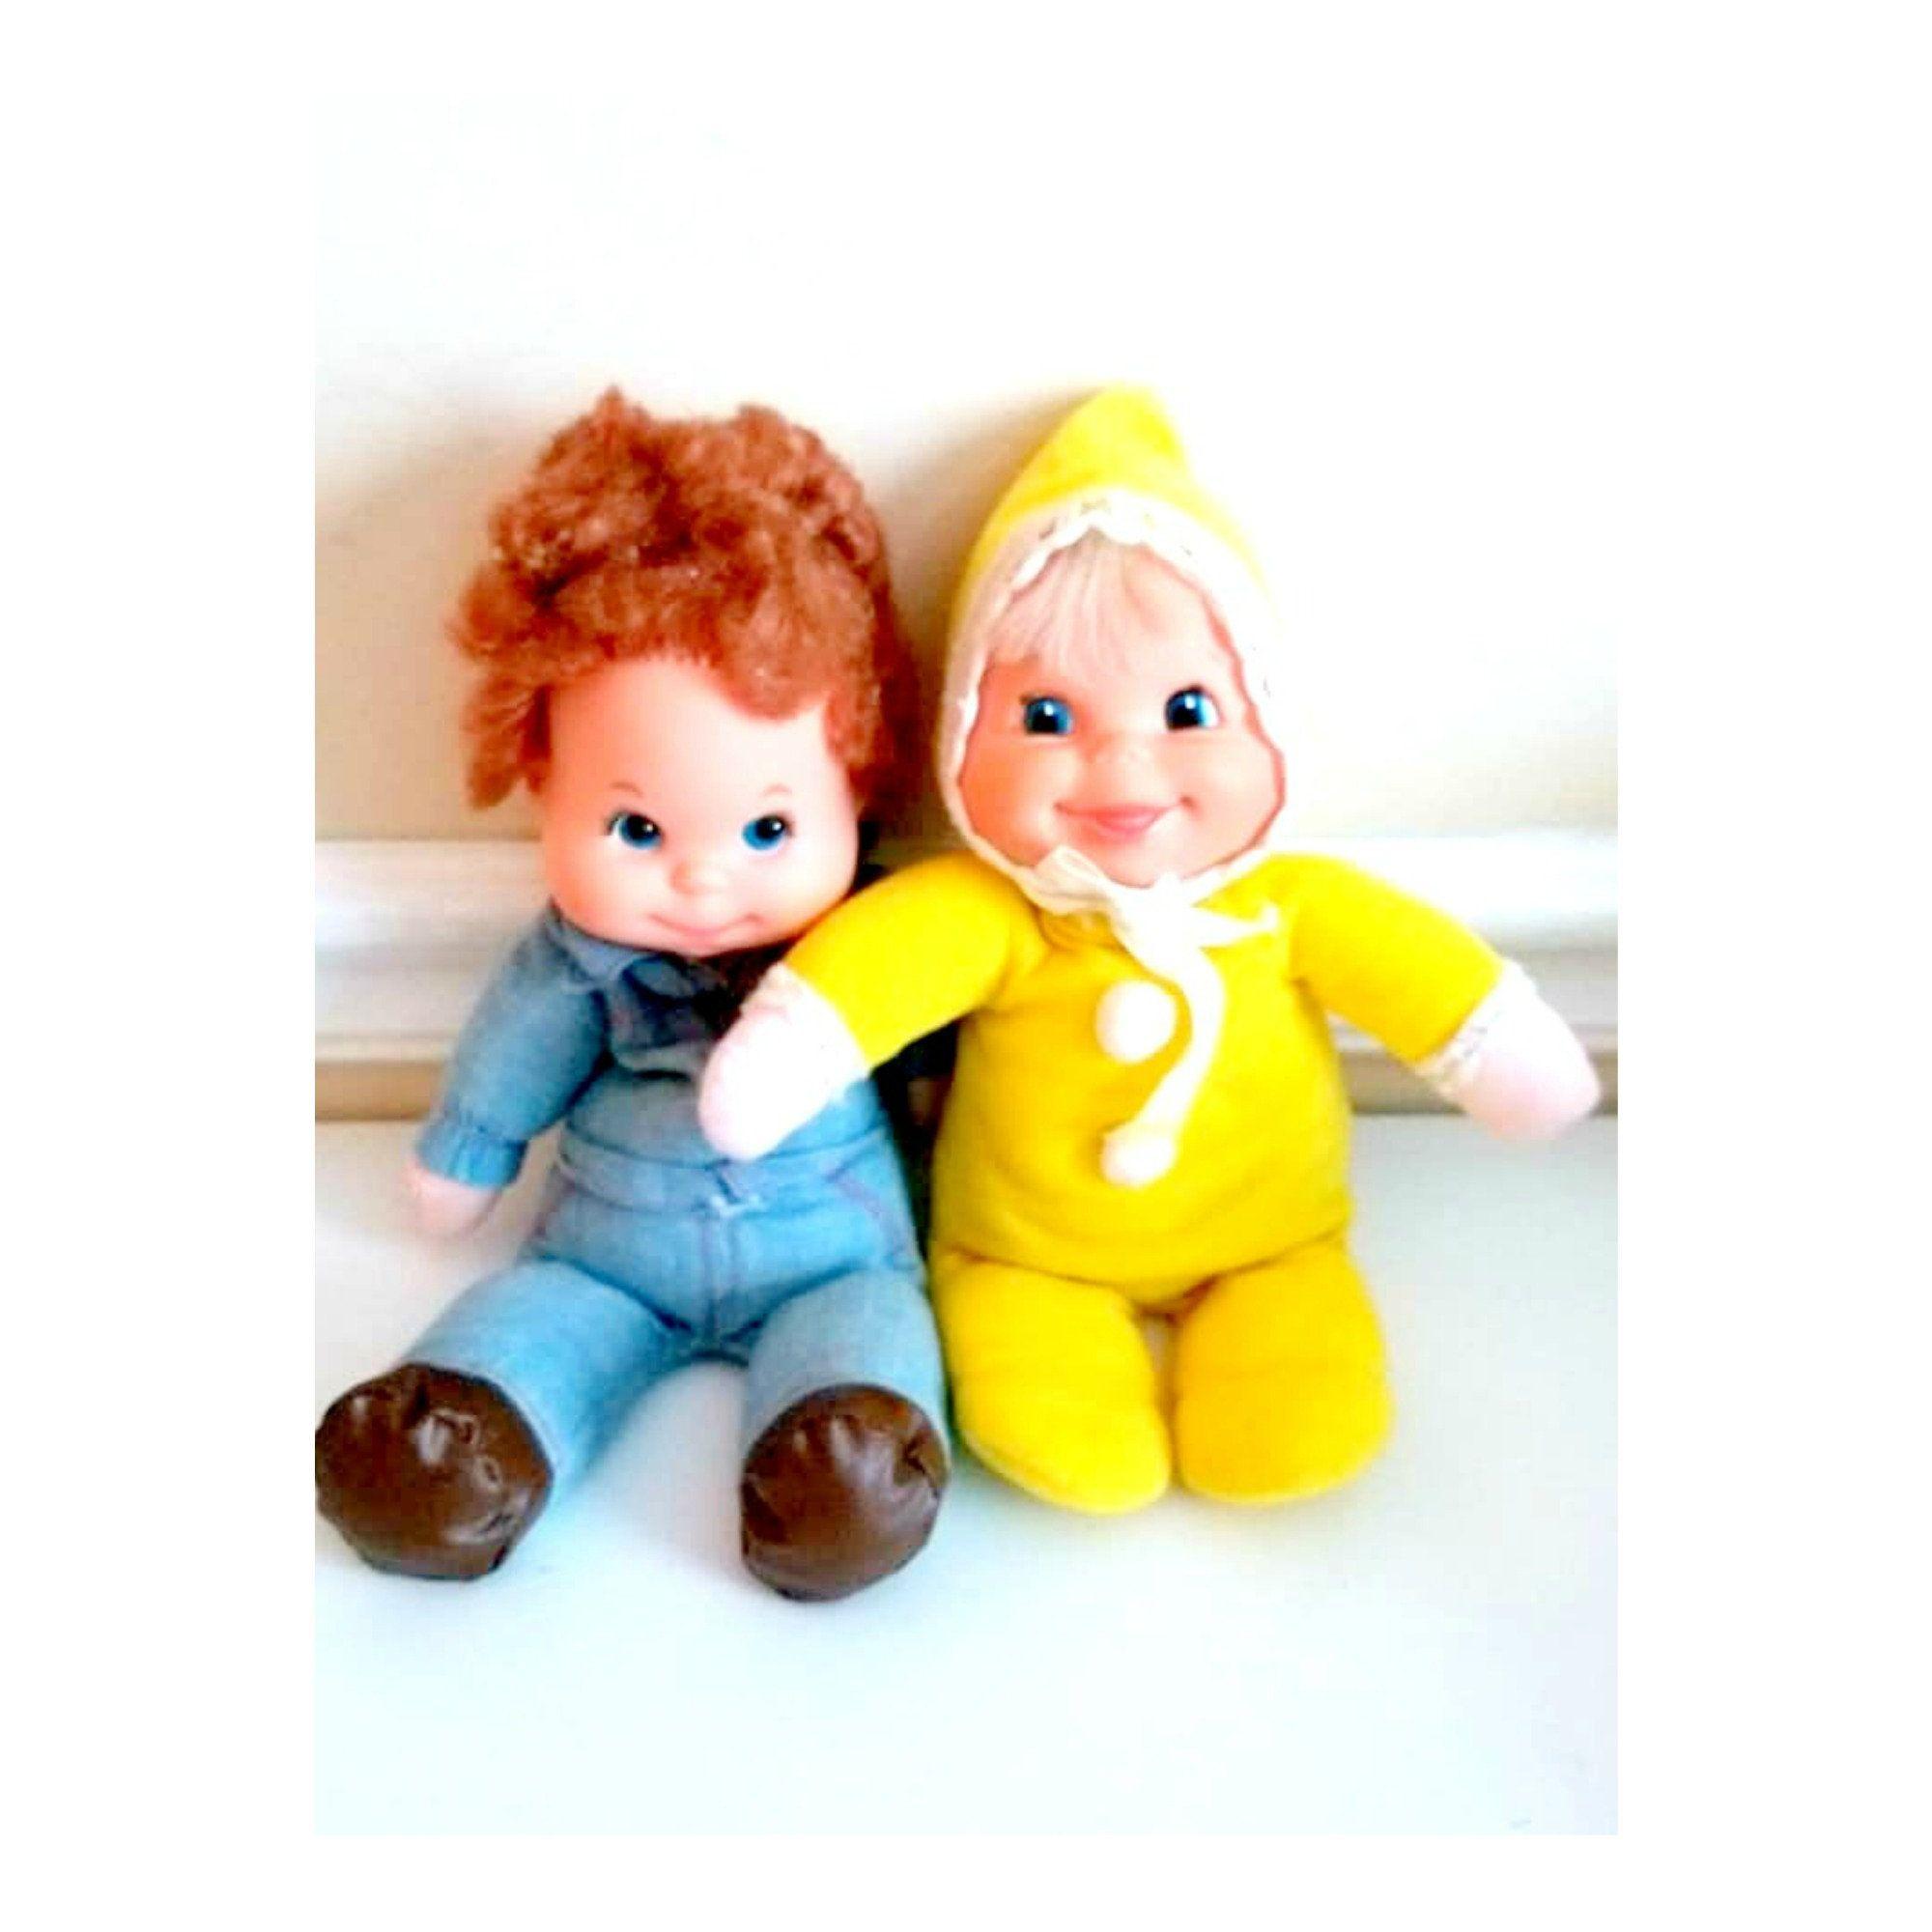 Vintage Mattel Baby Beans Doll,Set of 2 1970s #vintagetoys